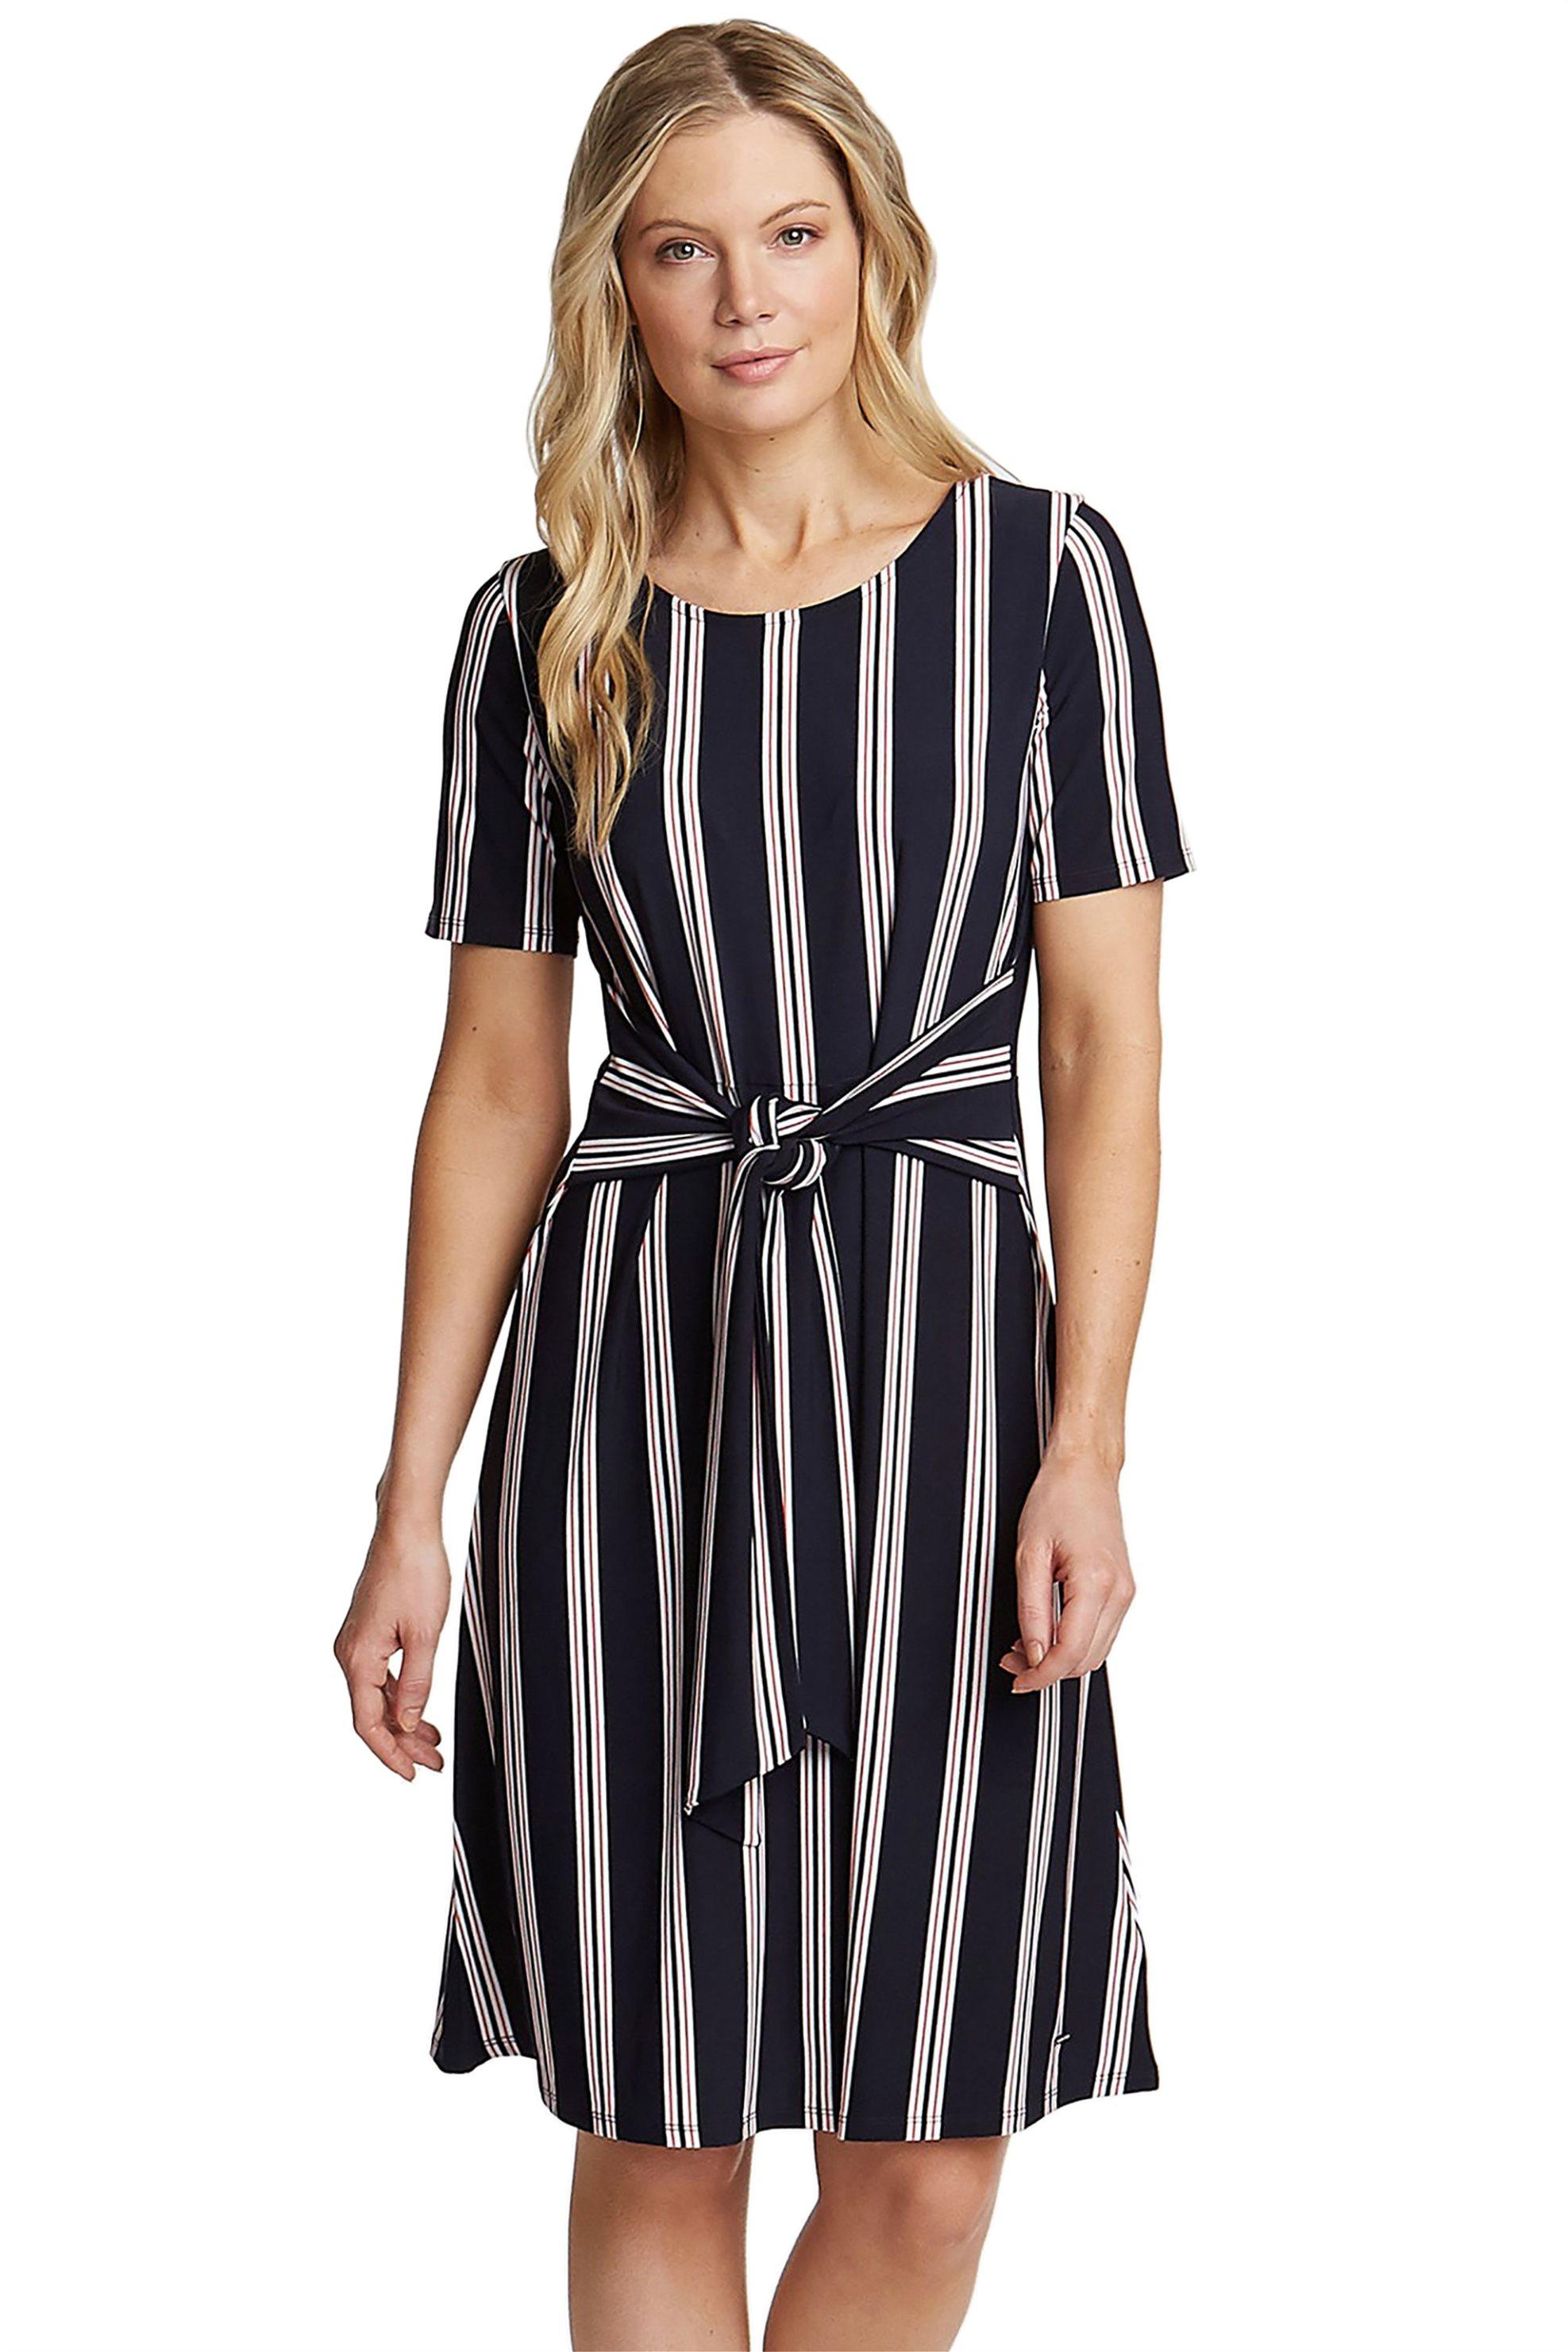 fce023bede NAUTICA - Γυναικεία Φορέματα